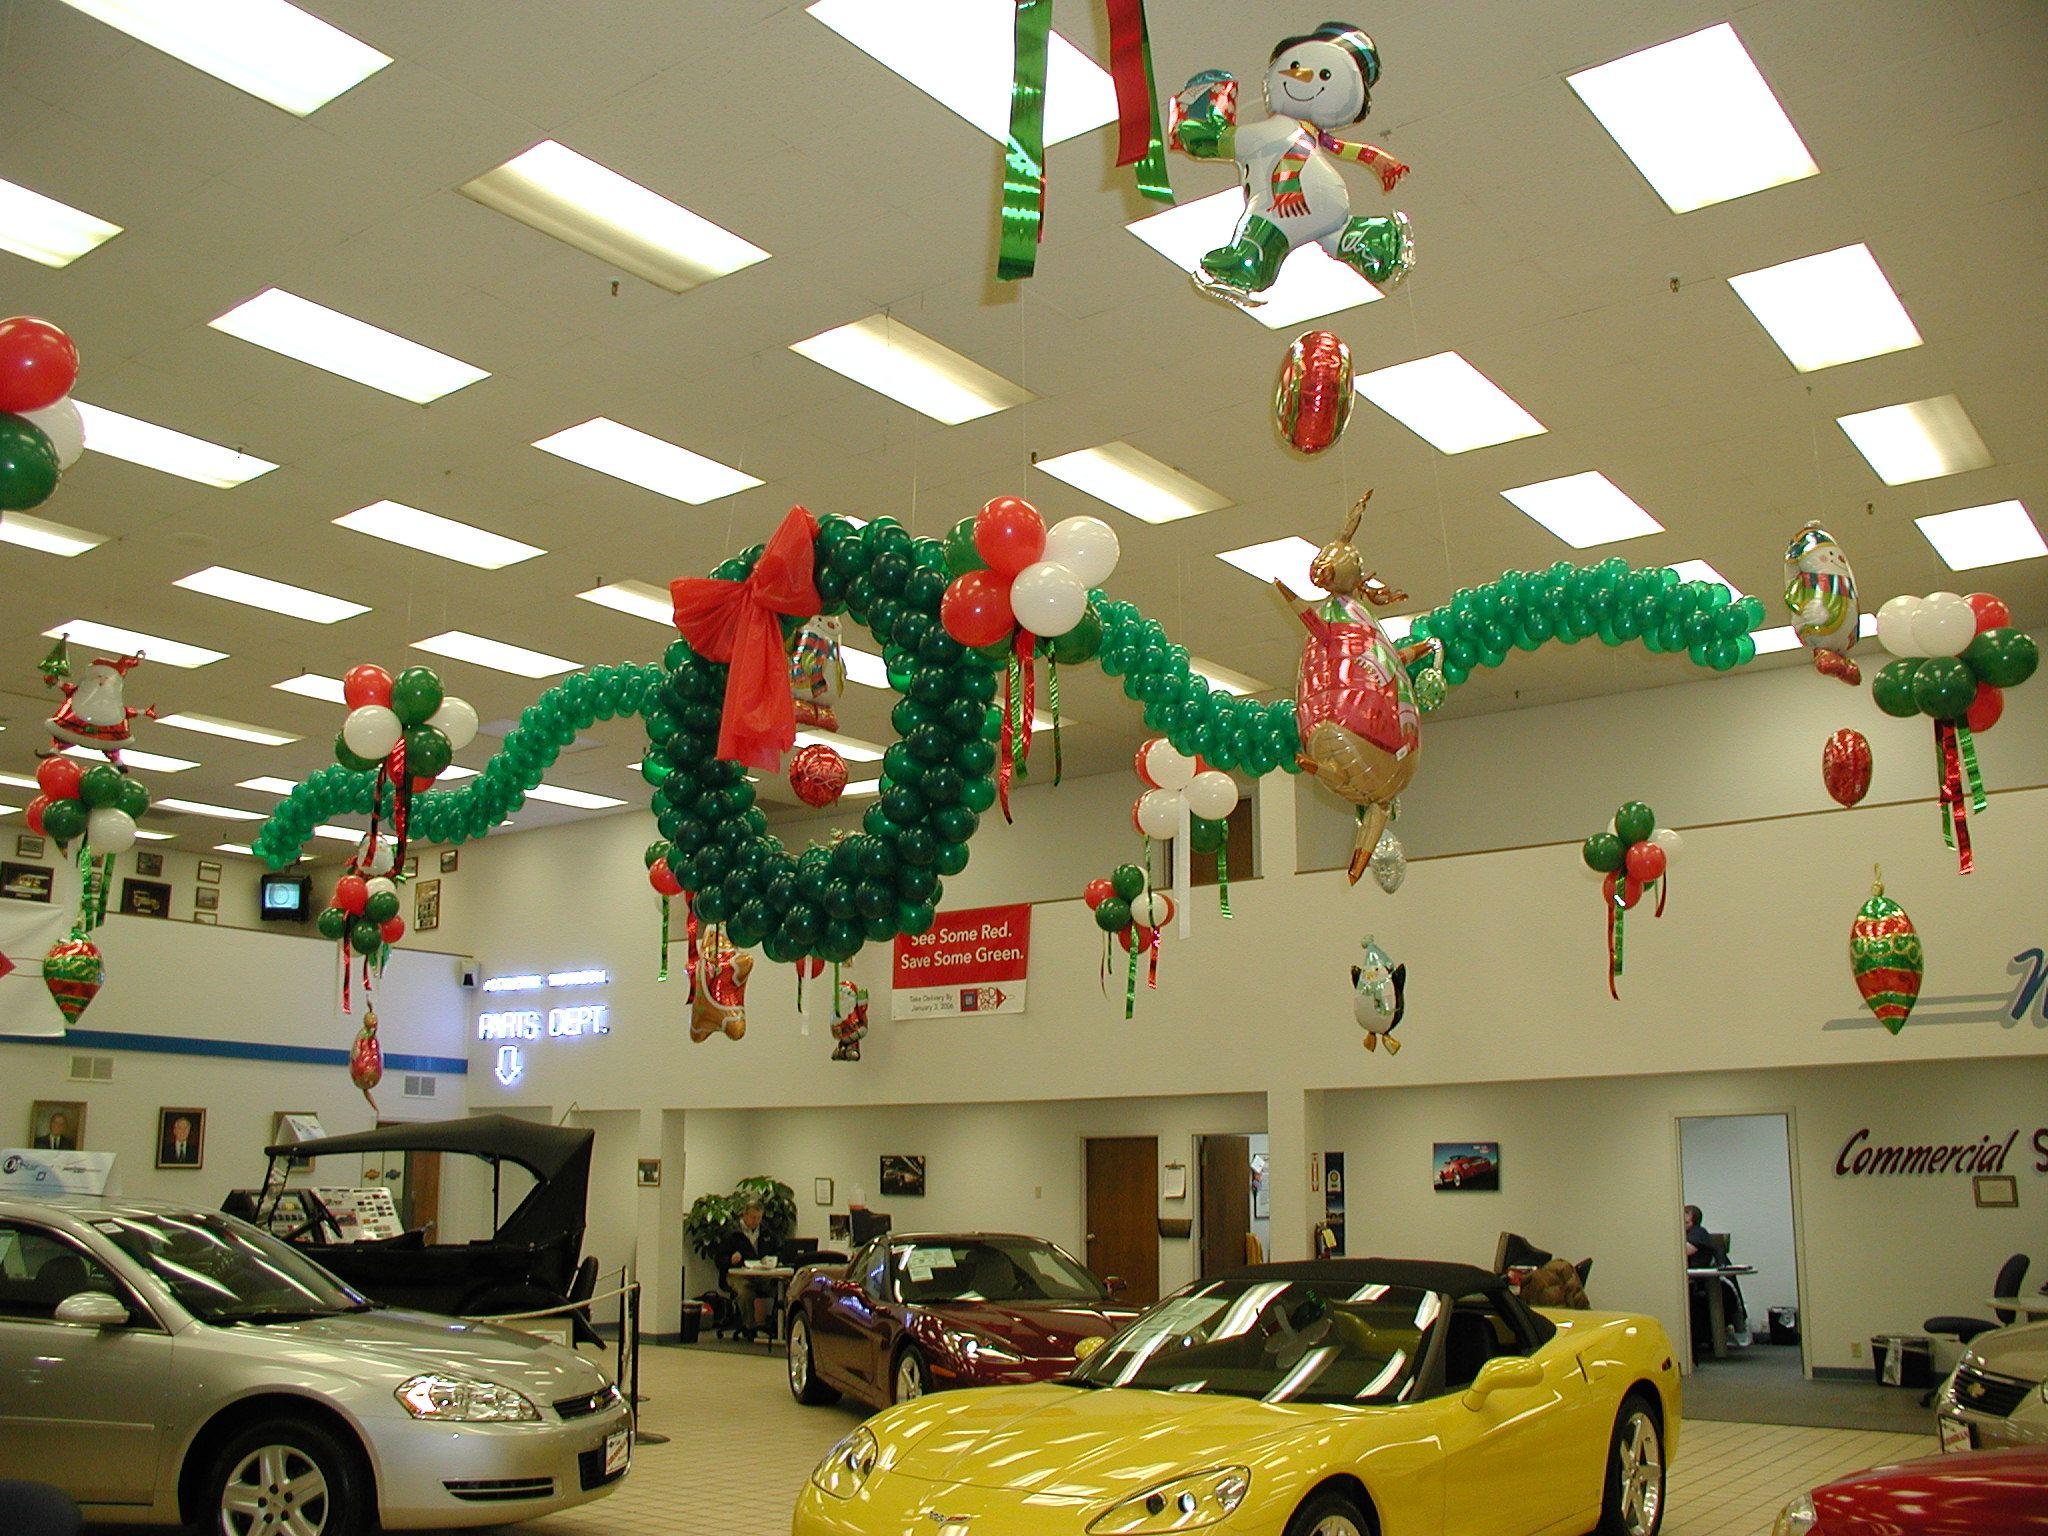 christmas balloons balloon decorations christmas party decorations christmas time all things christmas